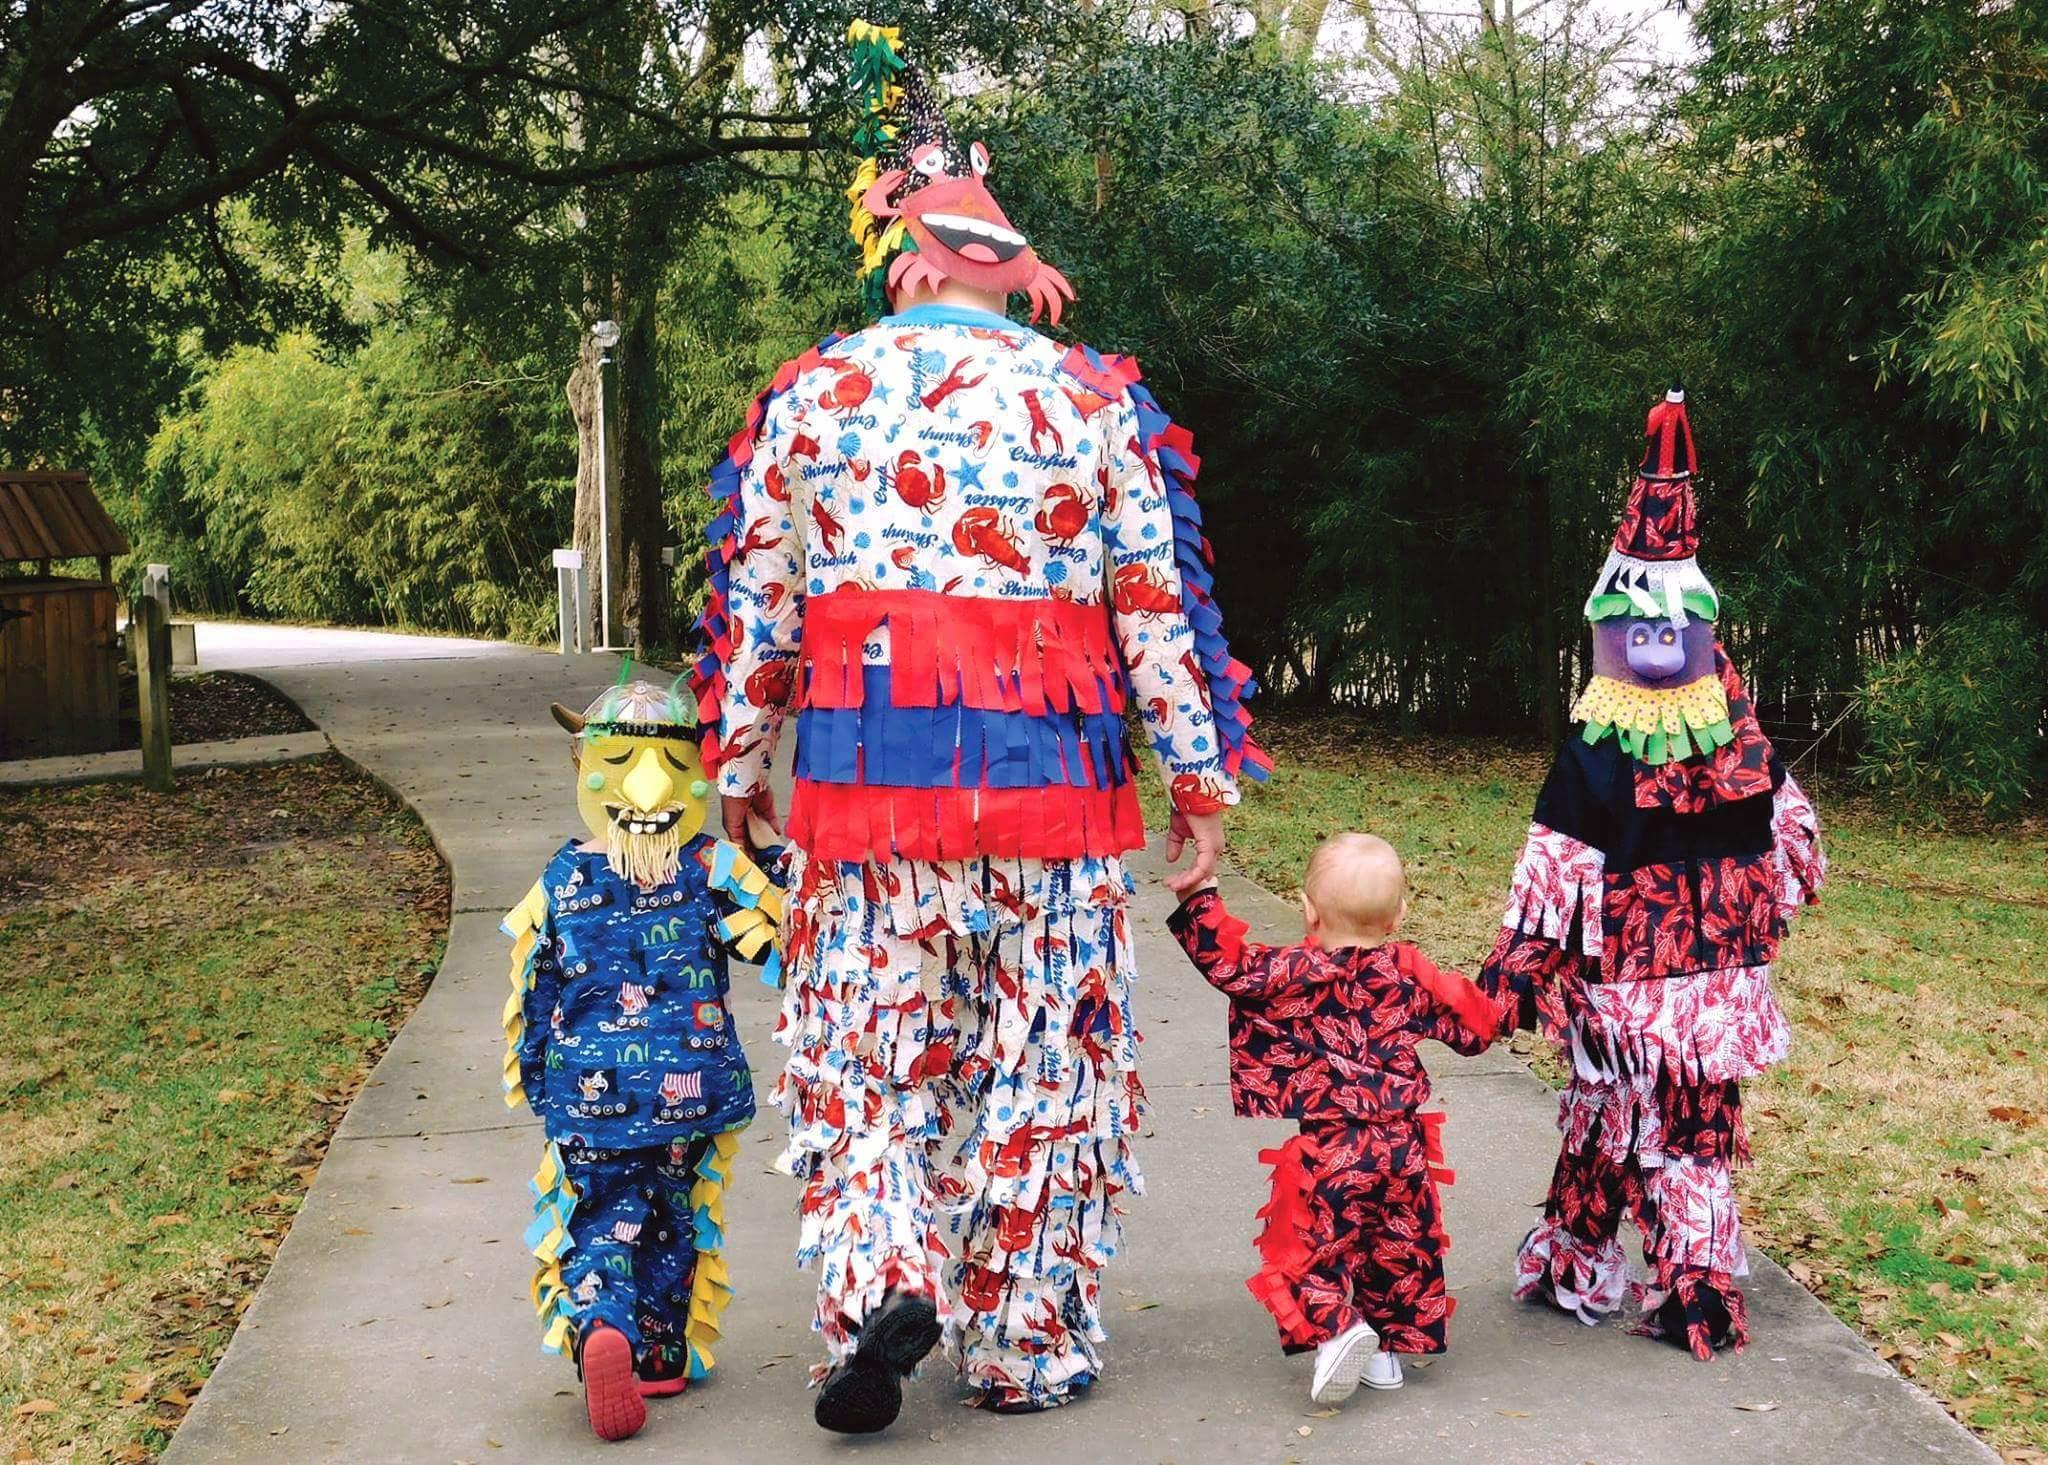 Shop ourmardi gras costumes -